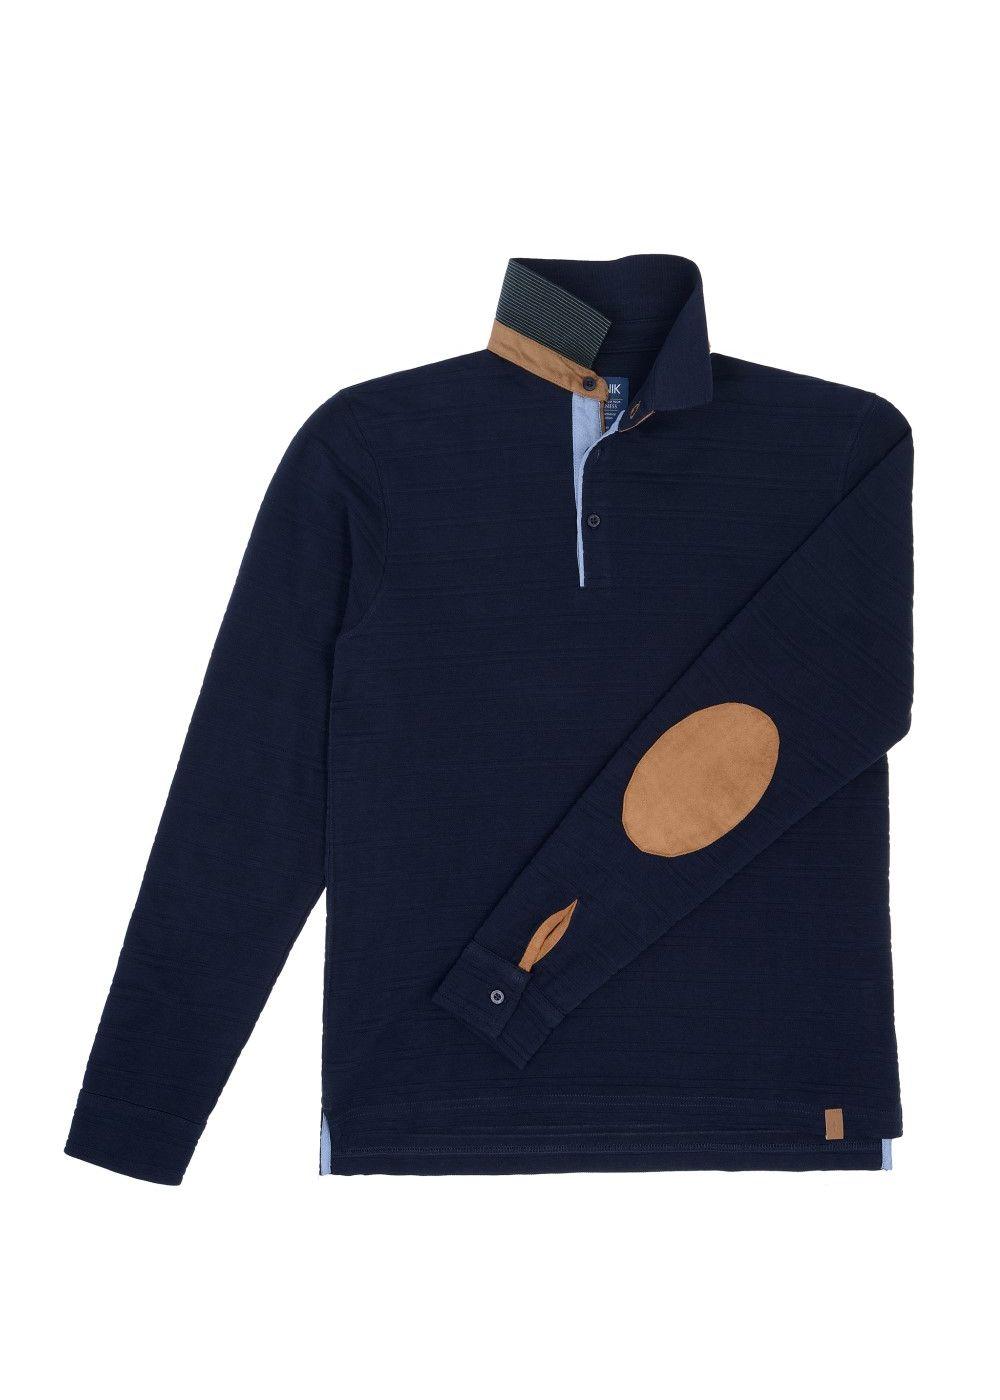 Koszula polo POLMT-0011-69(Z19)